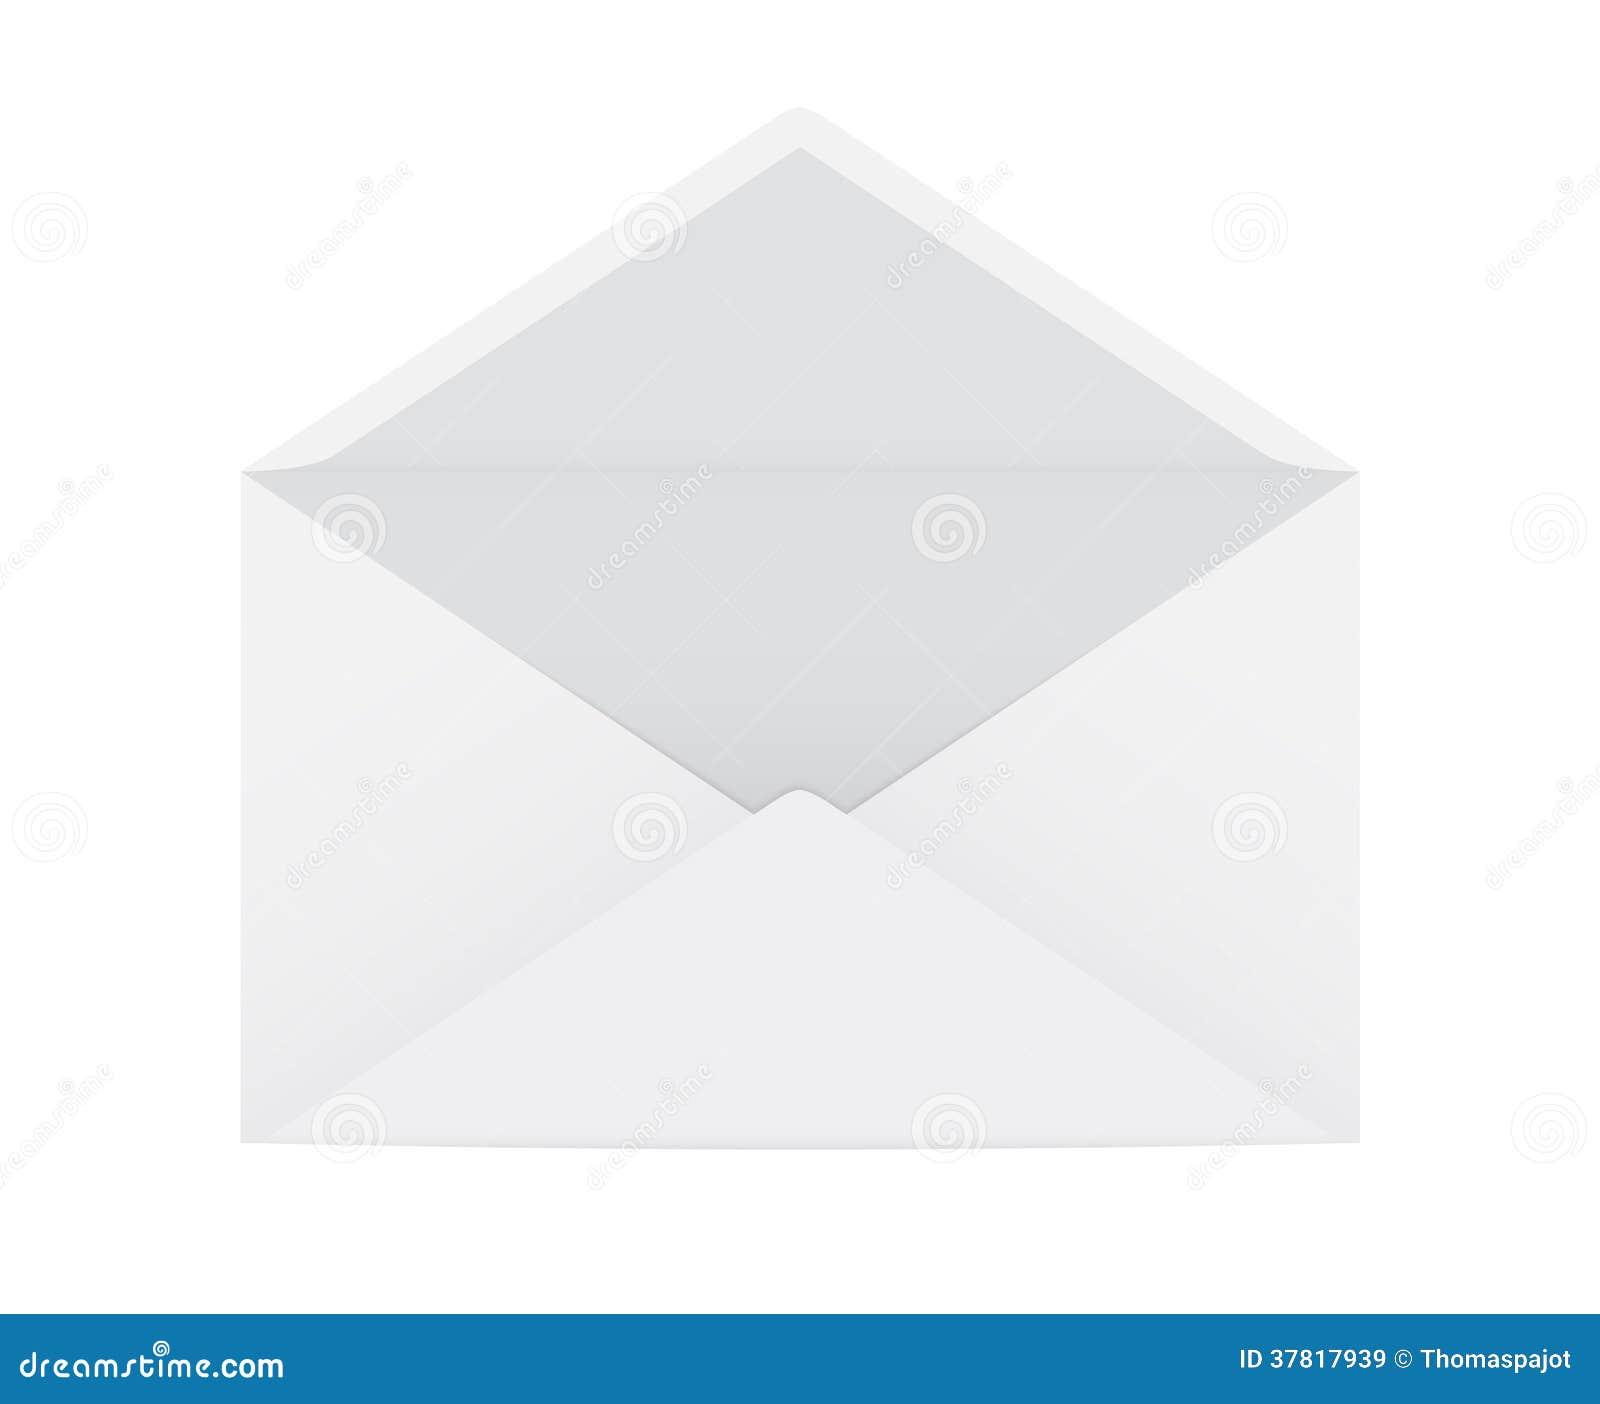 Open envelop